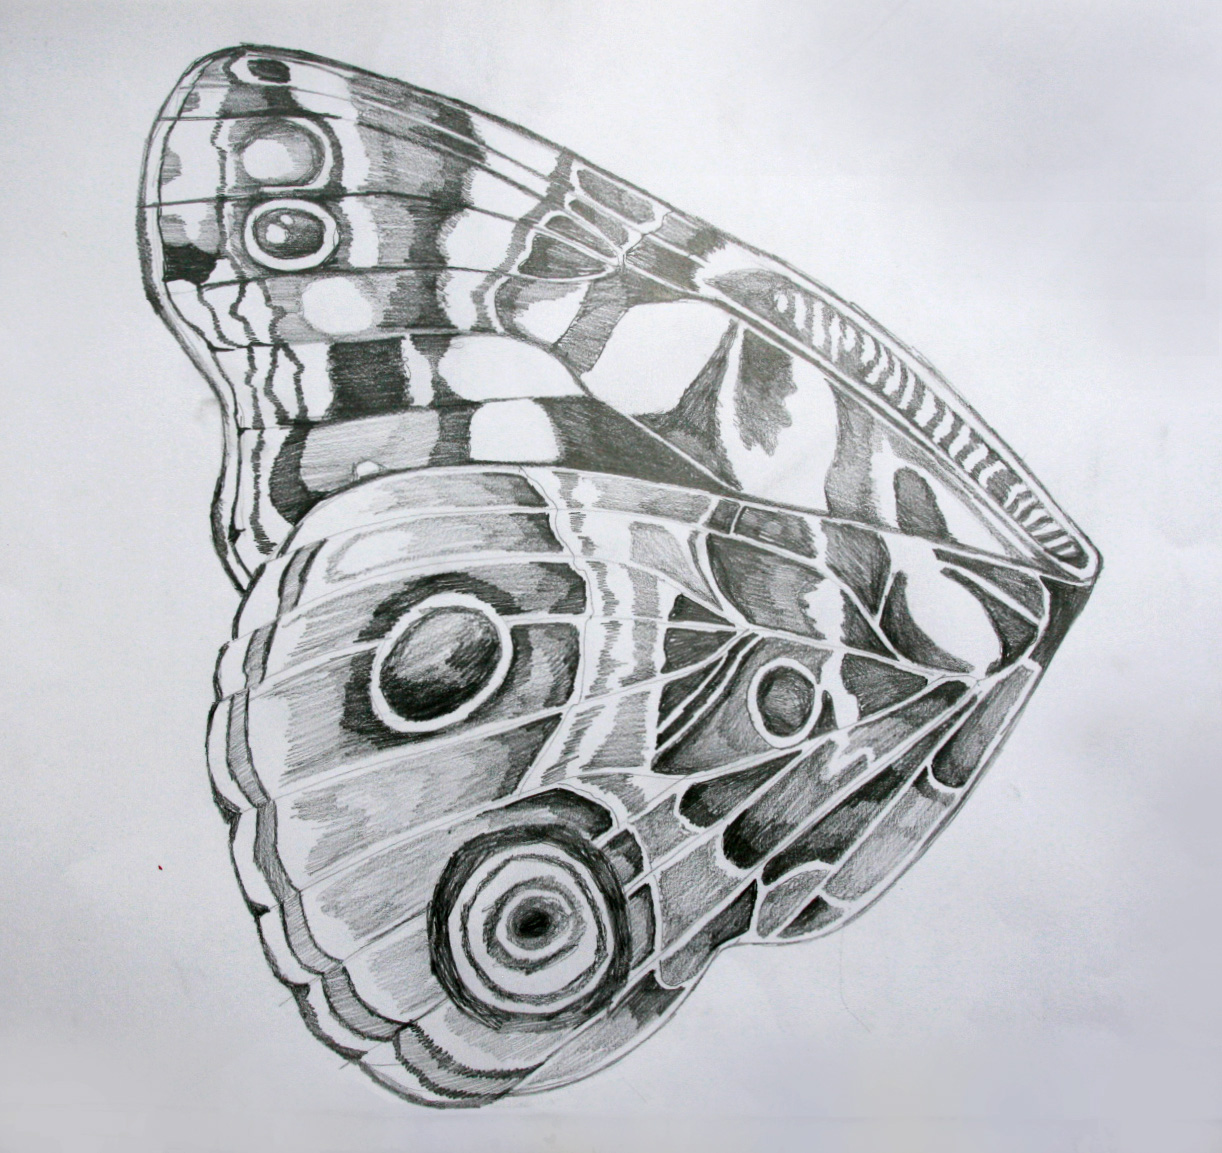 Pavla Richterova Motyli Kridla